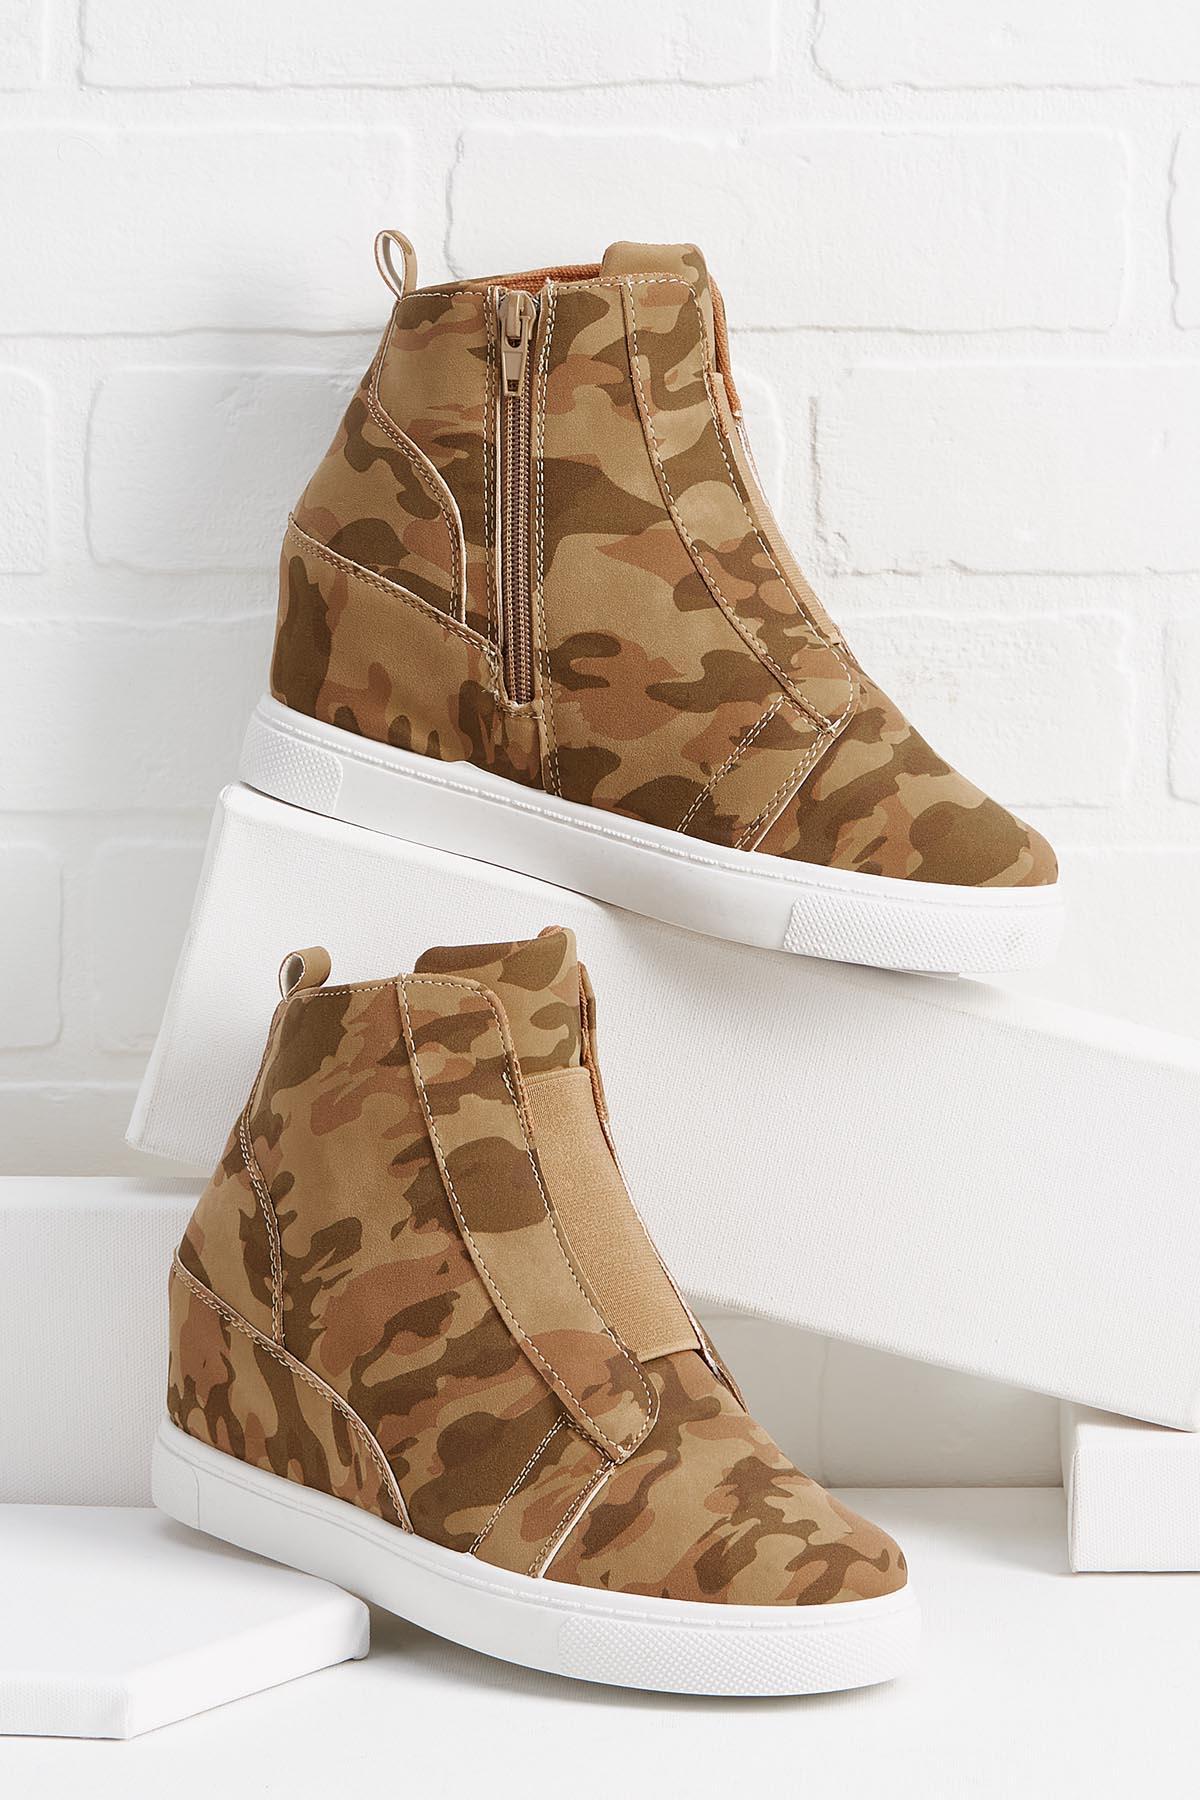 Let's Salute Sneakers